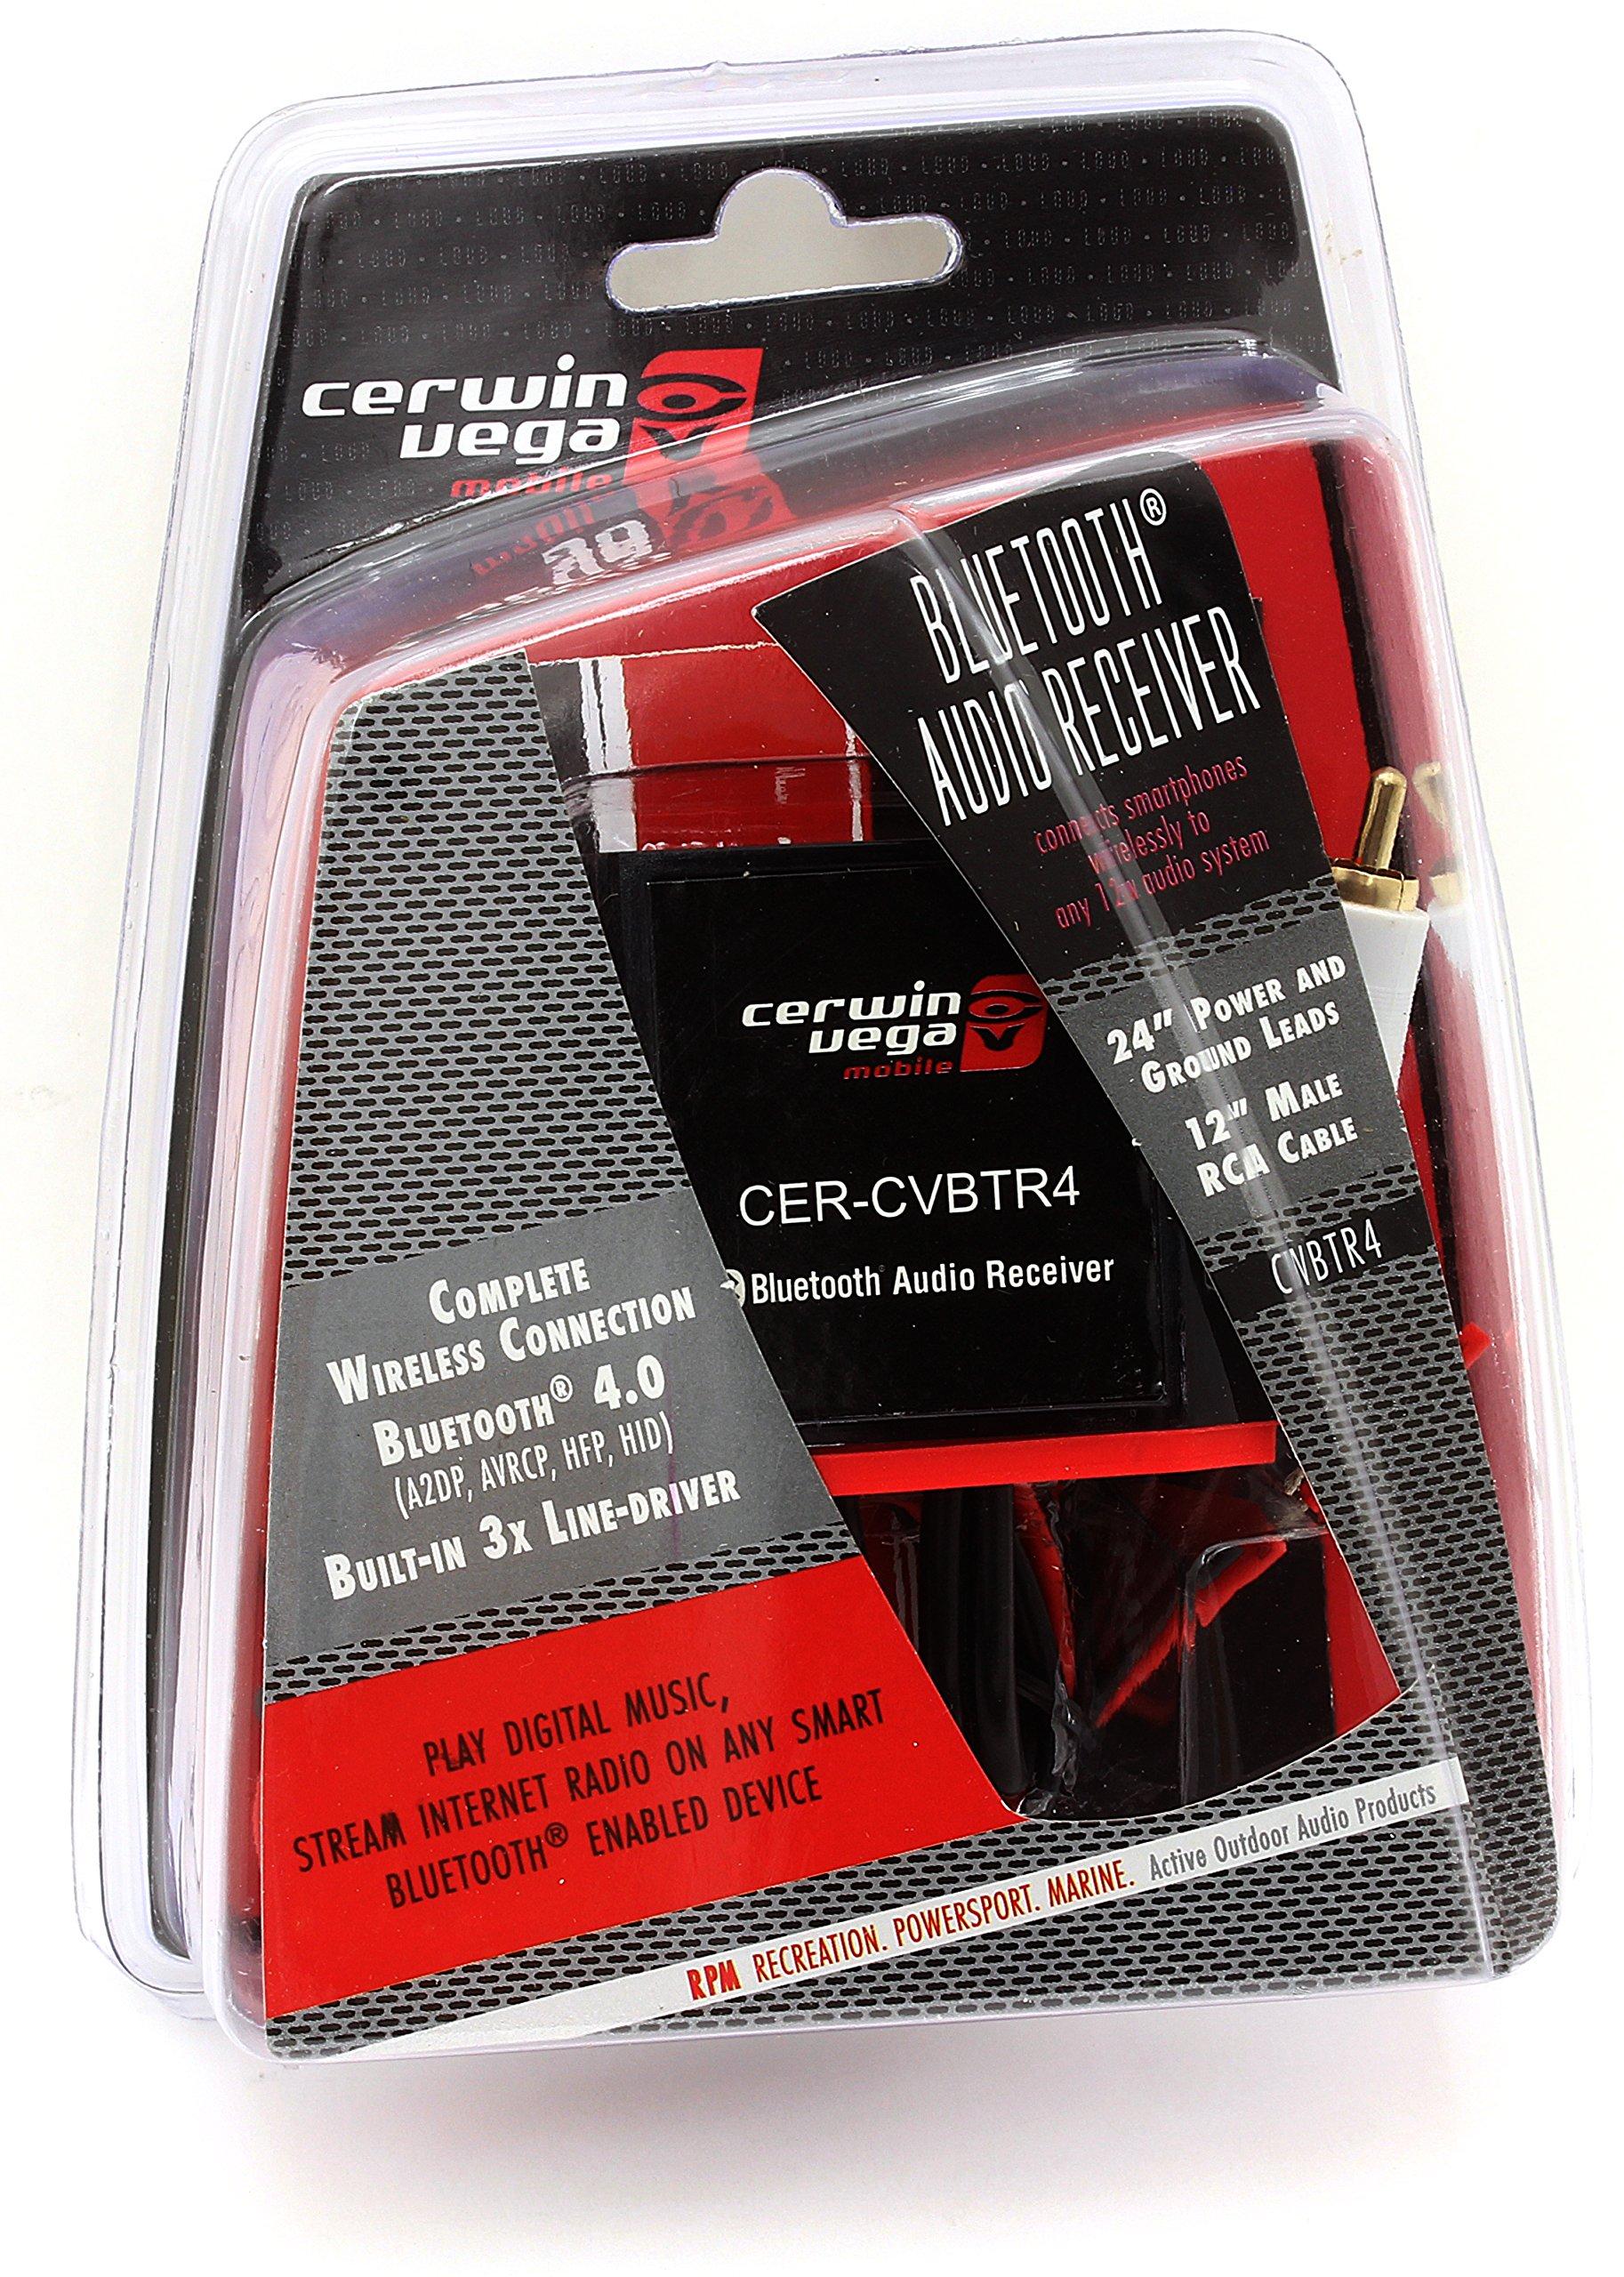 CVBTR4 - Cerwin Vega Universal Bluetooth Audio Receiver